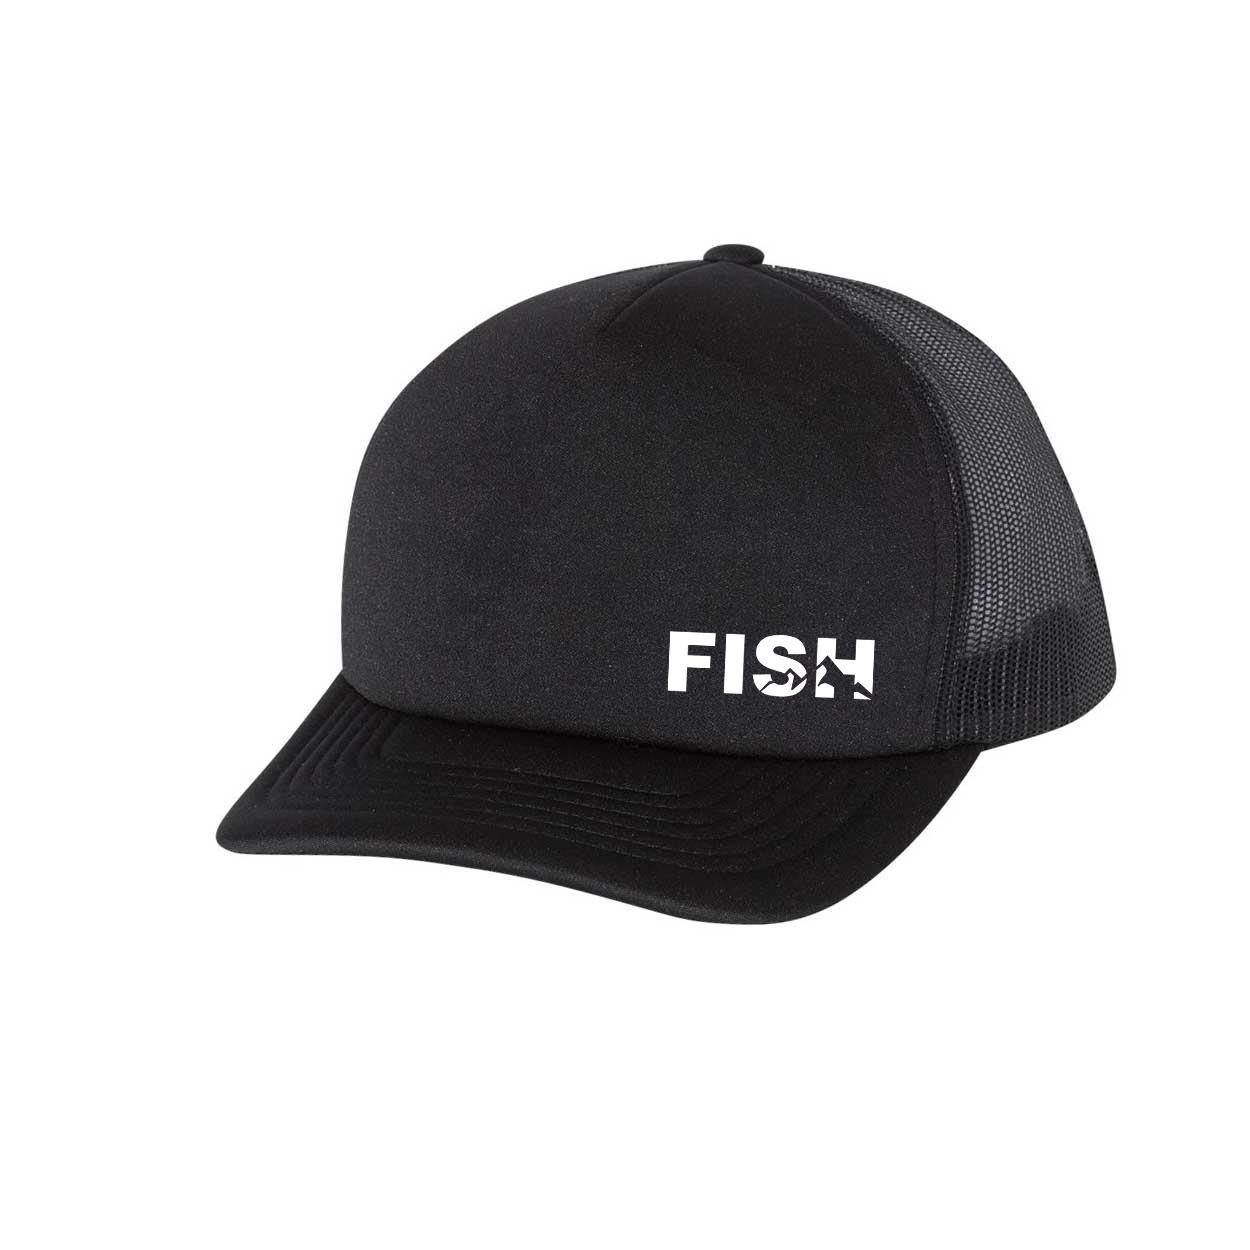 Fish Mountain Logo Night Out Premium Foam Trucker Snapback Hat Black (White Logo)